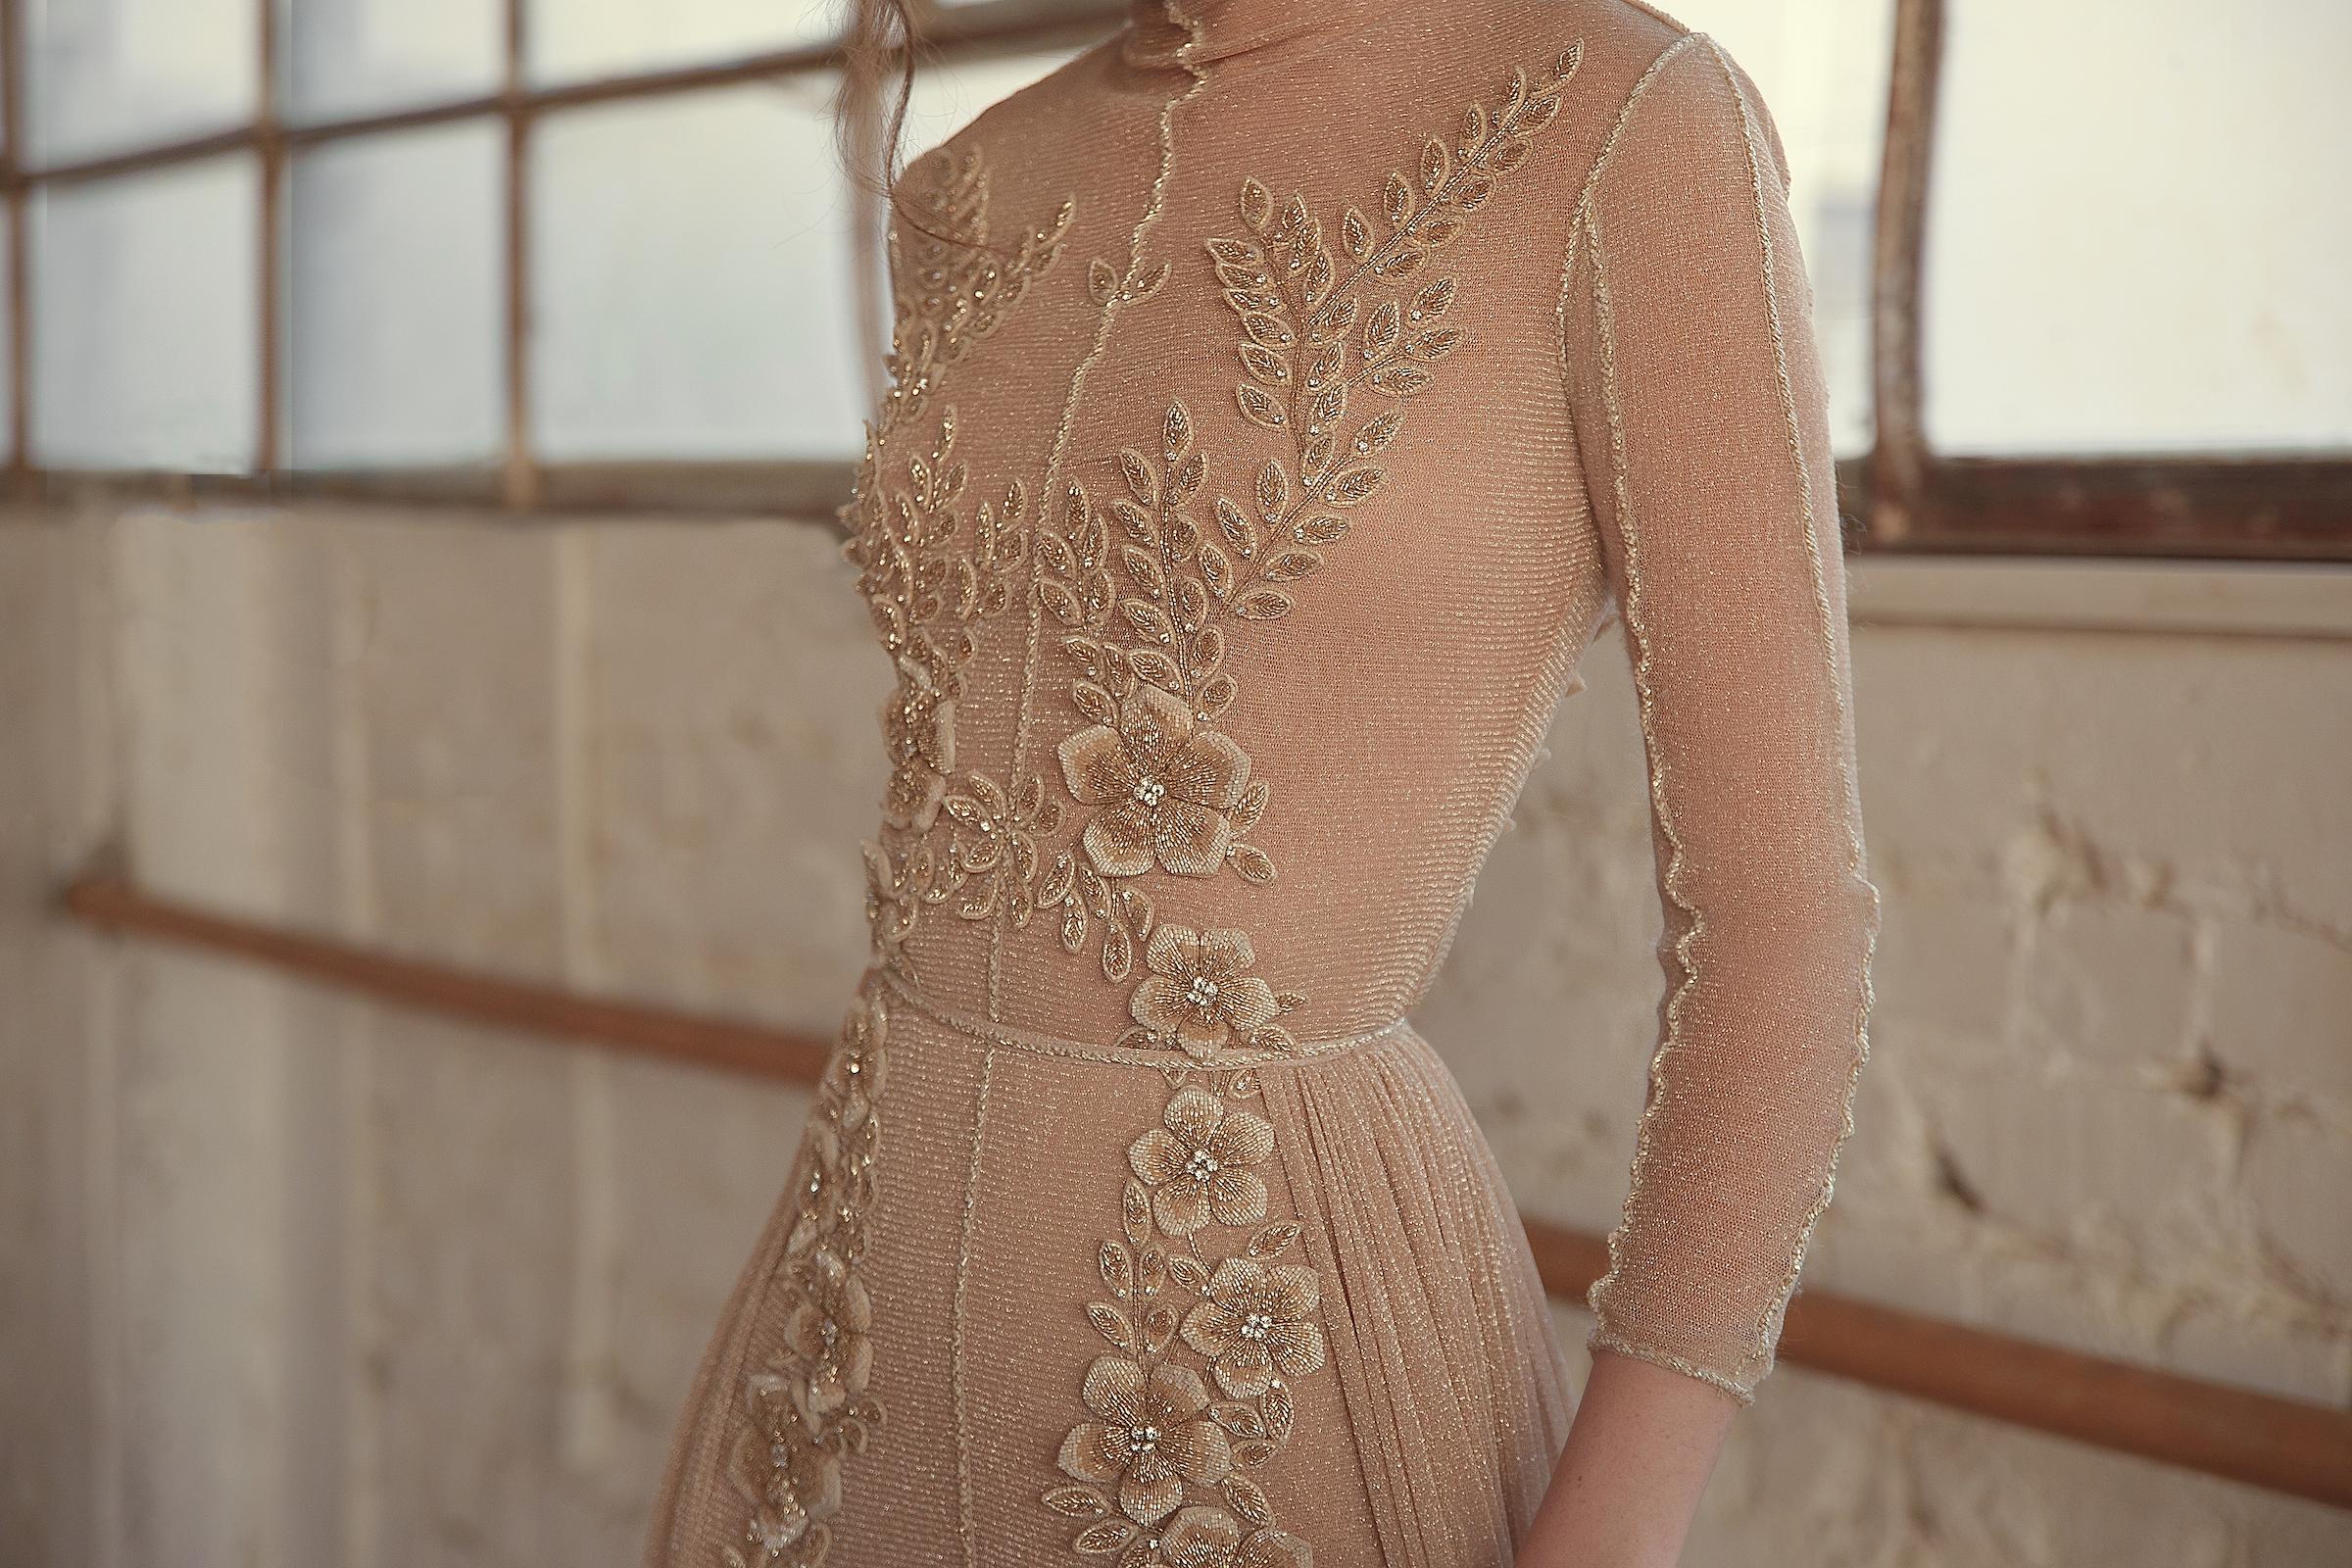 Chana Marelus Ellian Dress